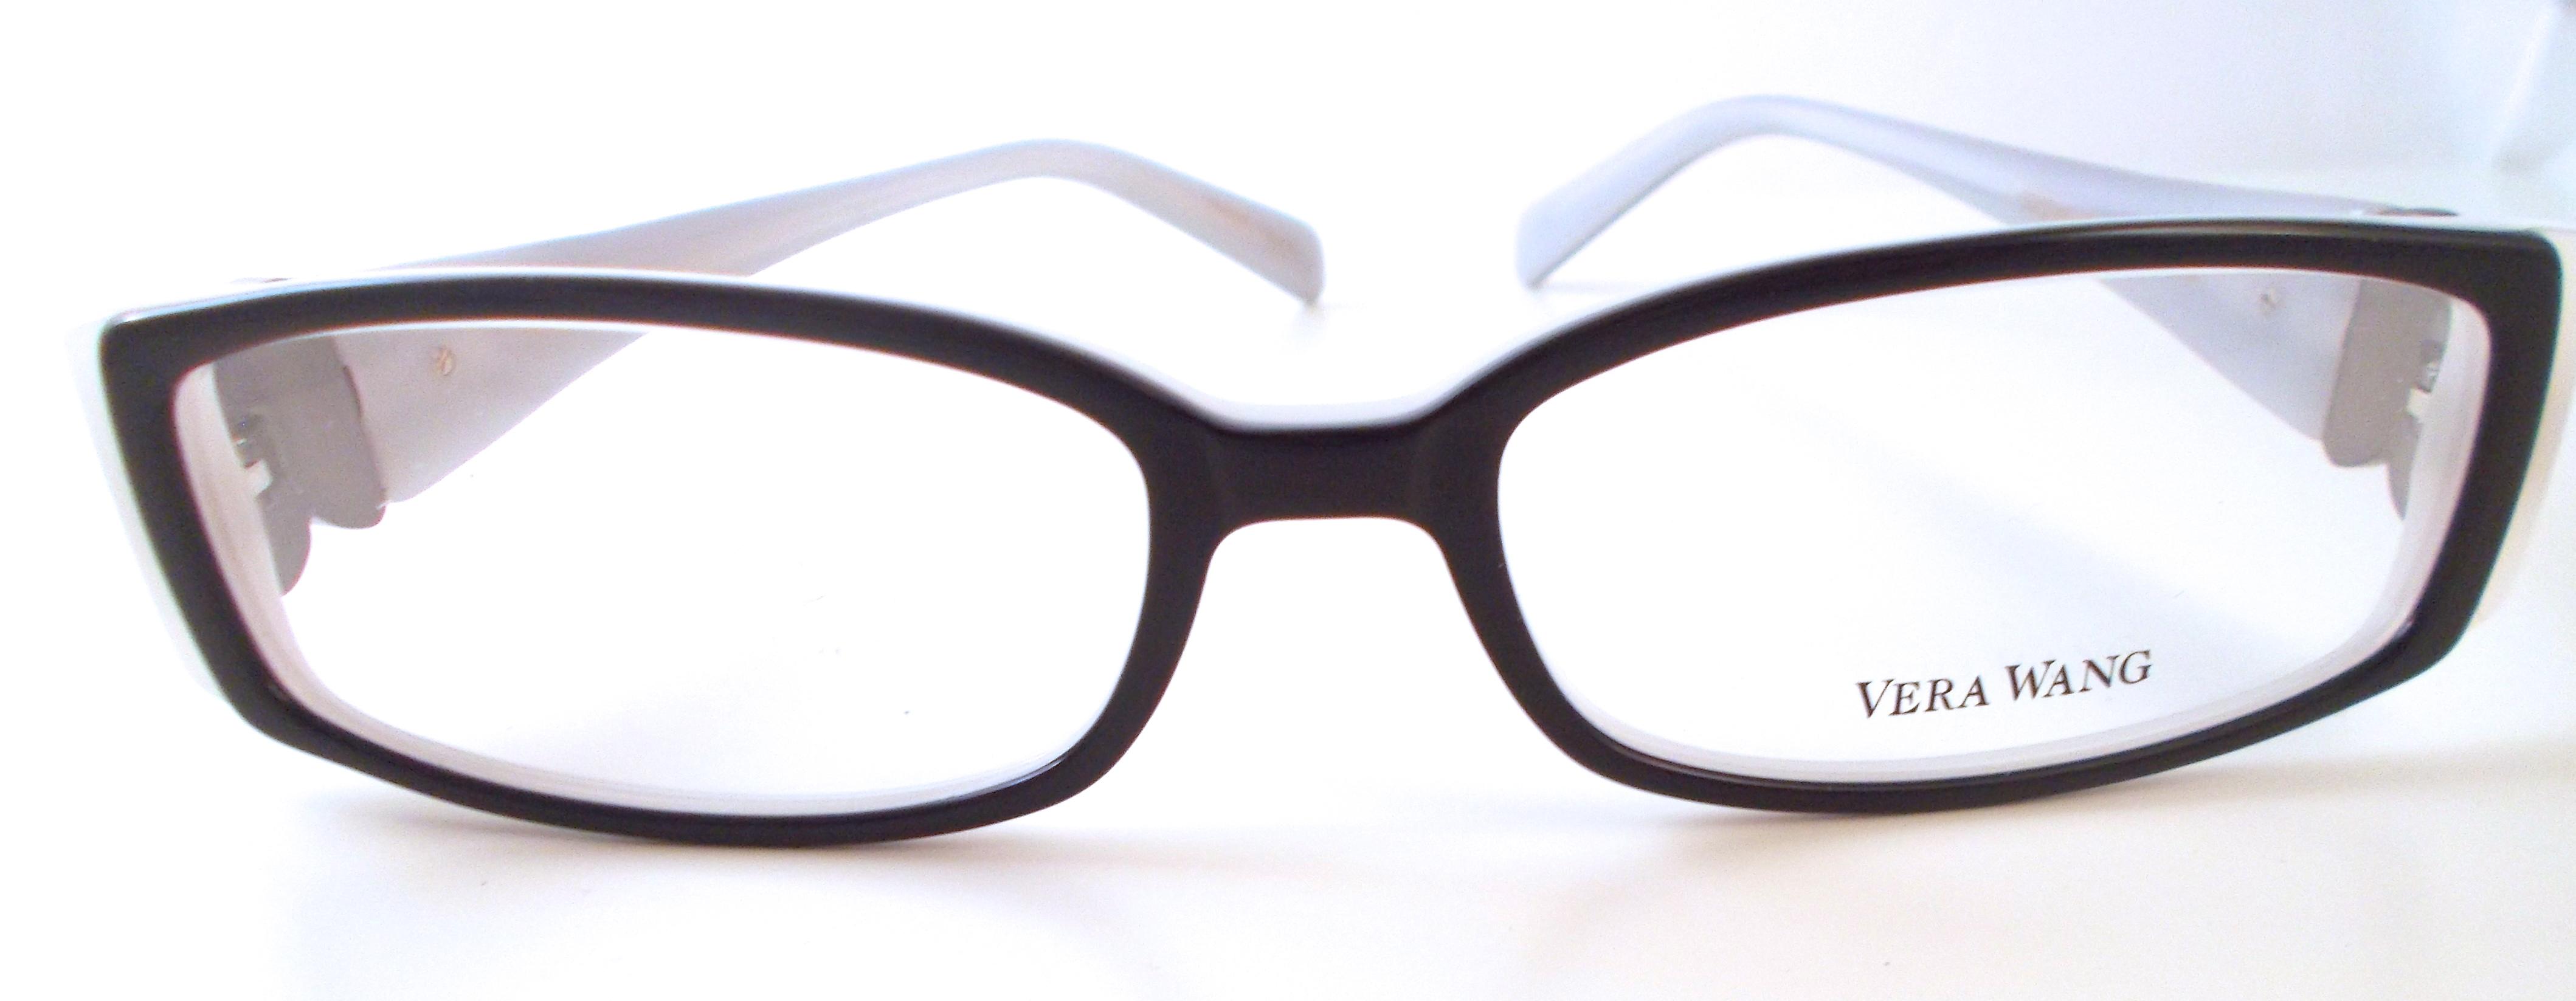 H&S Optical | Vera Wang Eyewear V031 Black/Gray | Online Store ...